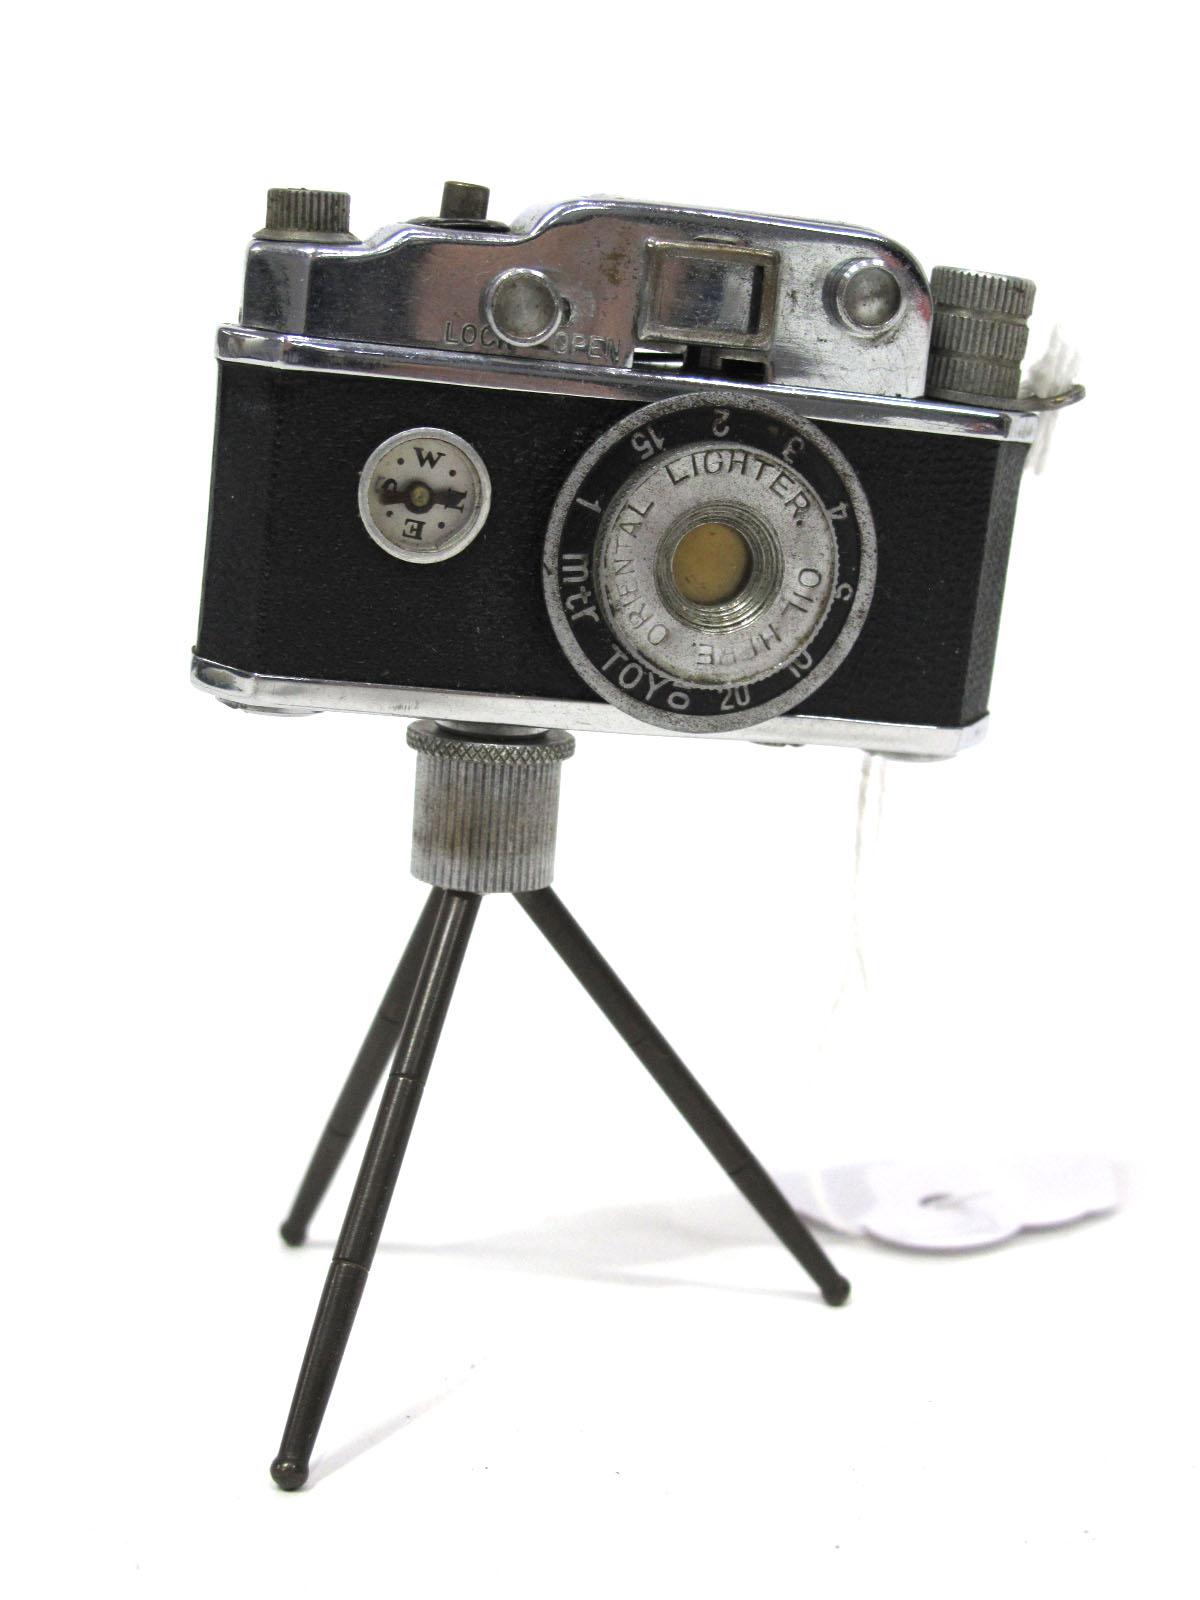 Camera Cigarette Lighter, on tri-pod with compass.